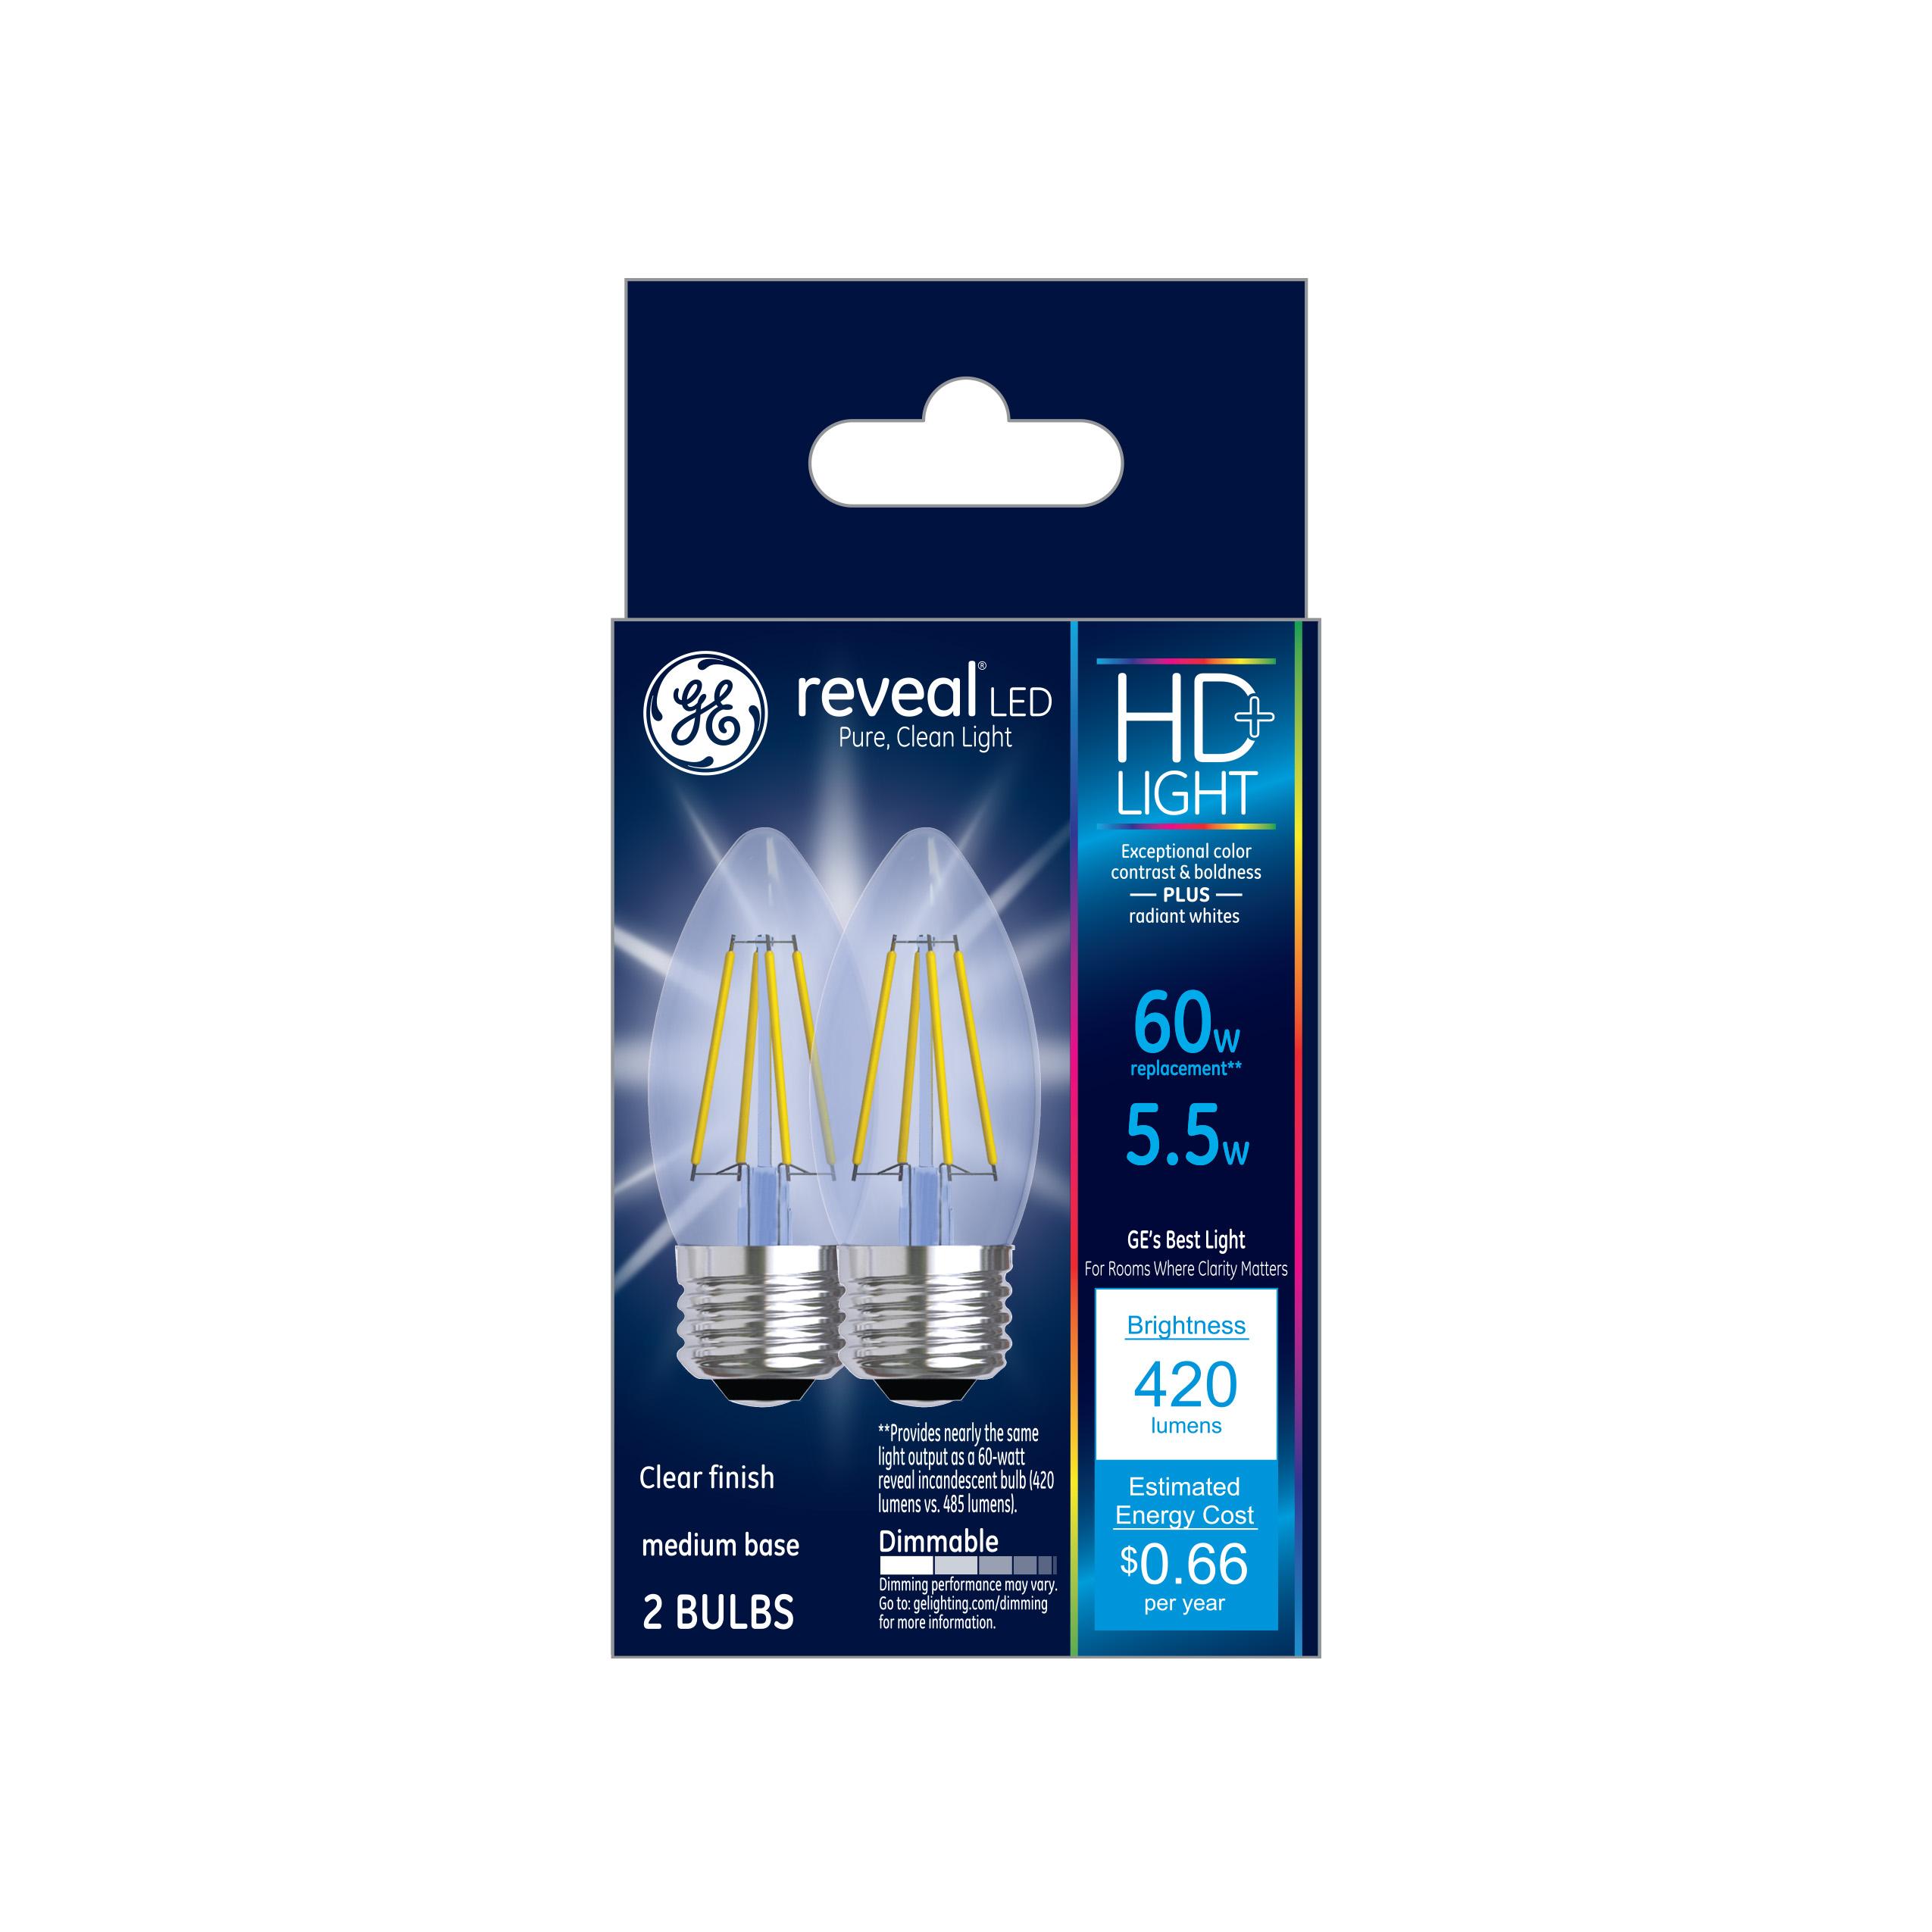 GE LED 5.5W HD Reveal Decorative Medium Base, Dimmable, 2pk Light Bulbs